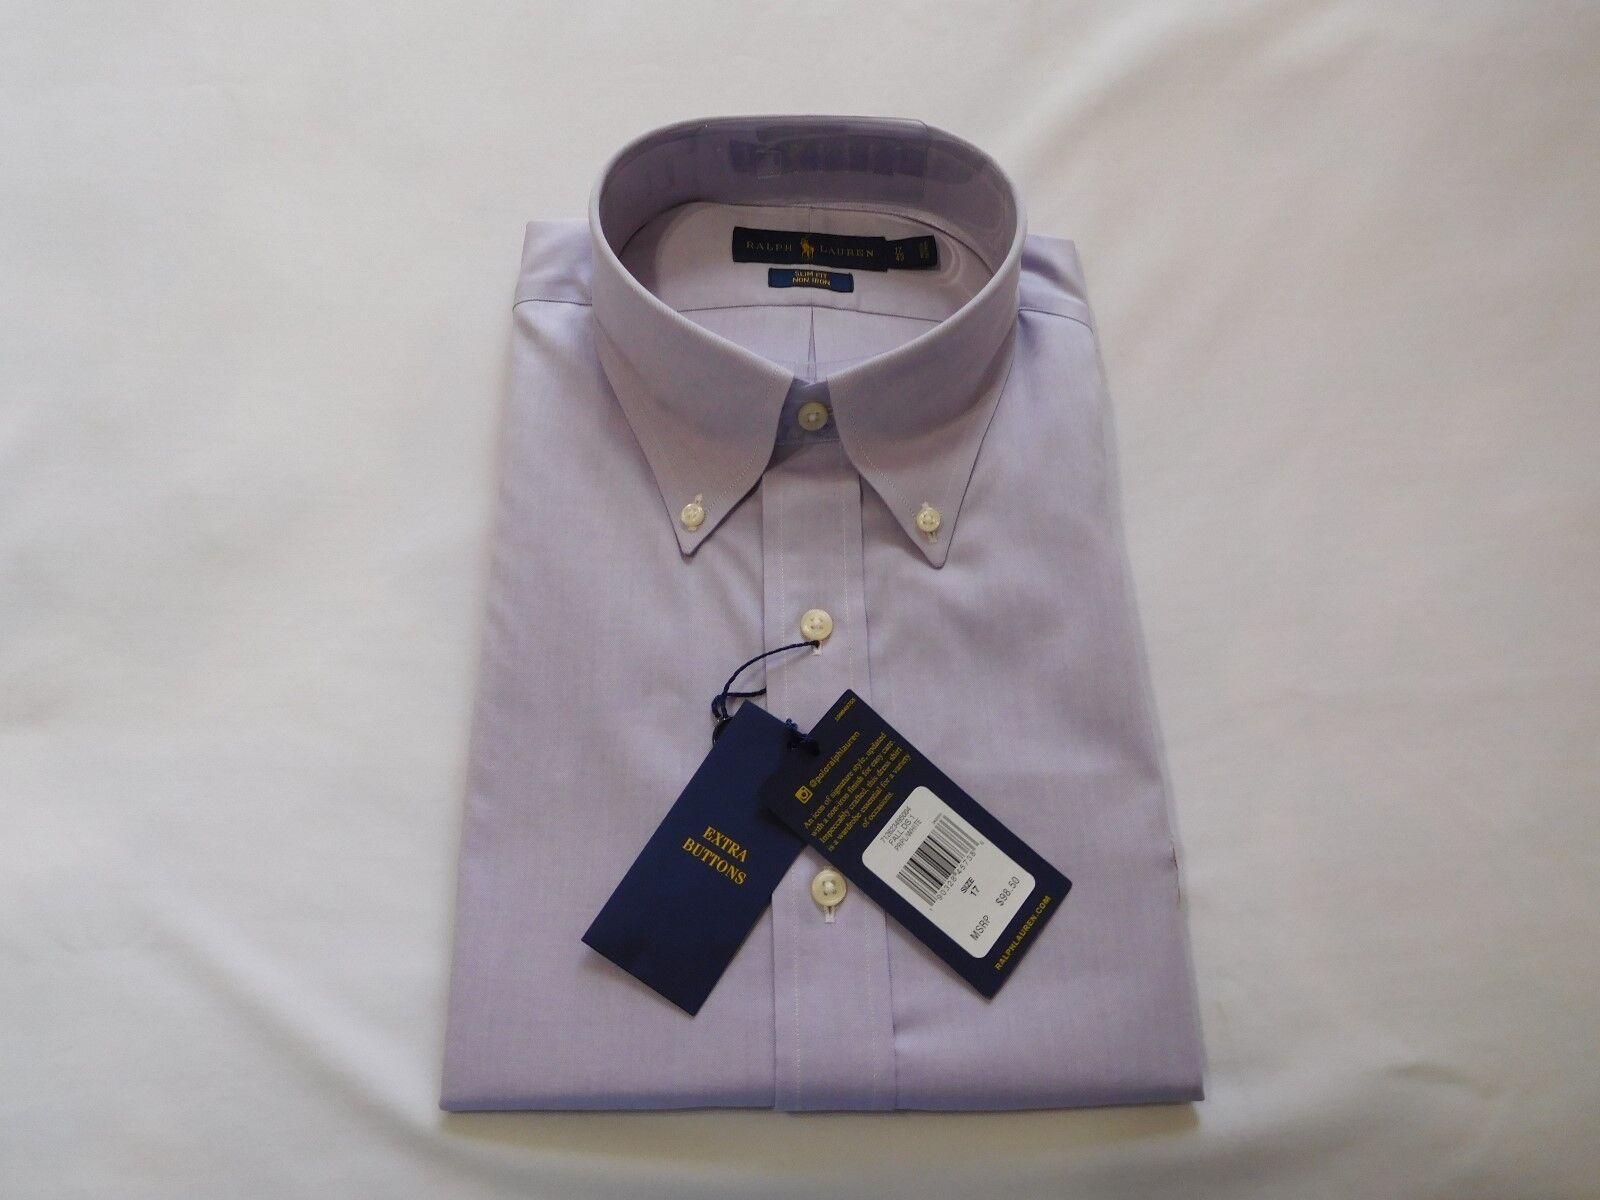 Ralph Lauren Slim-Fit Non-Iron Oxford Shirt 17.5  - Light Purple - NEW